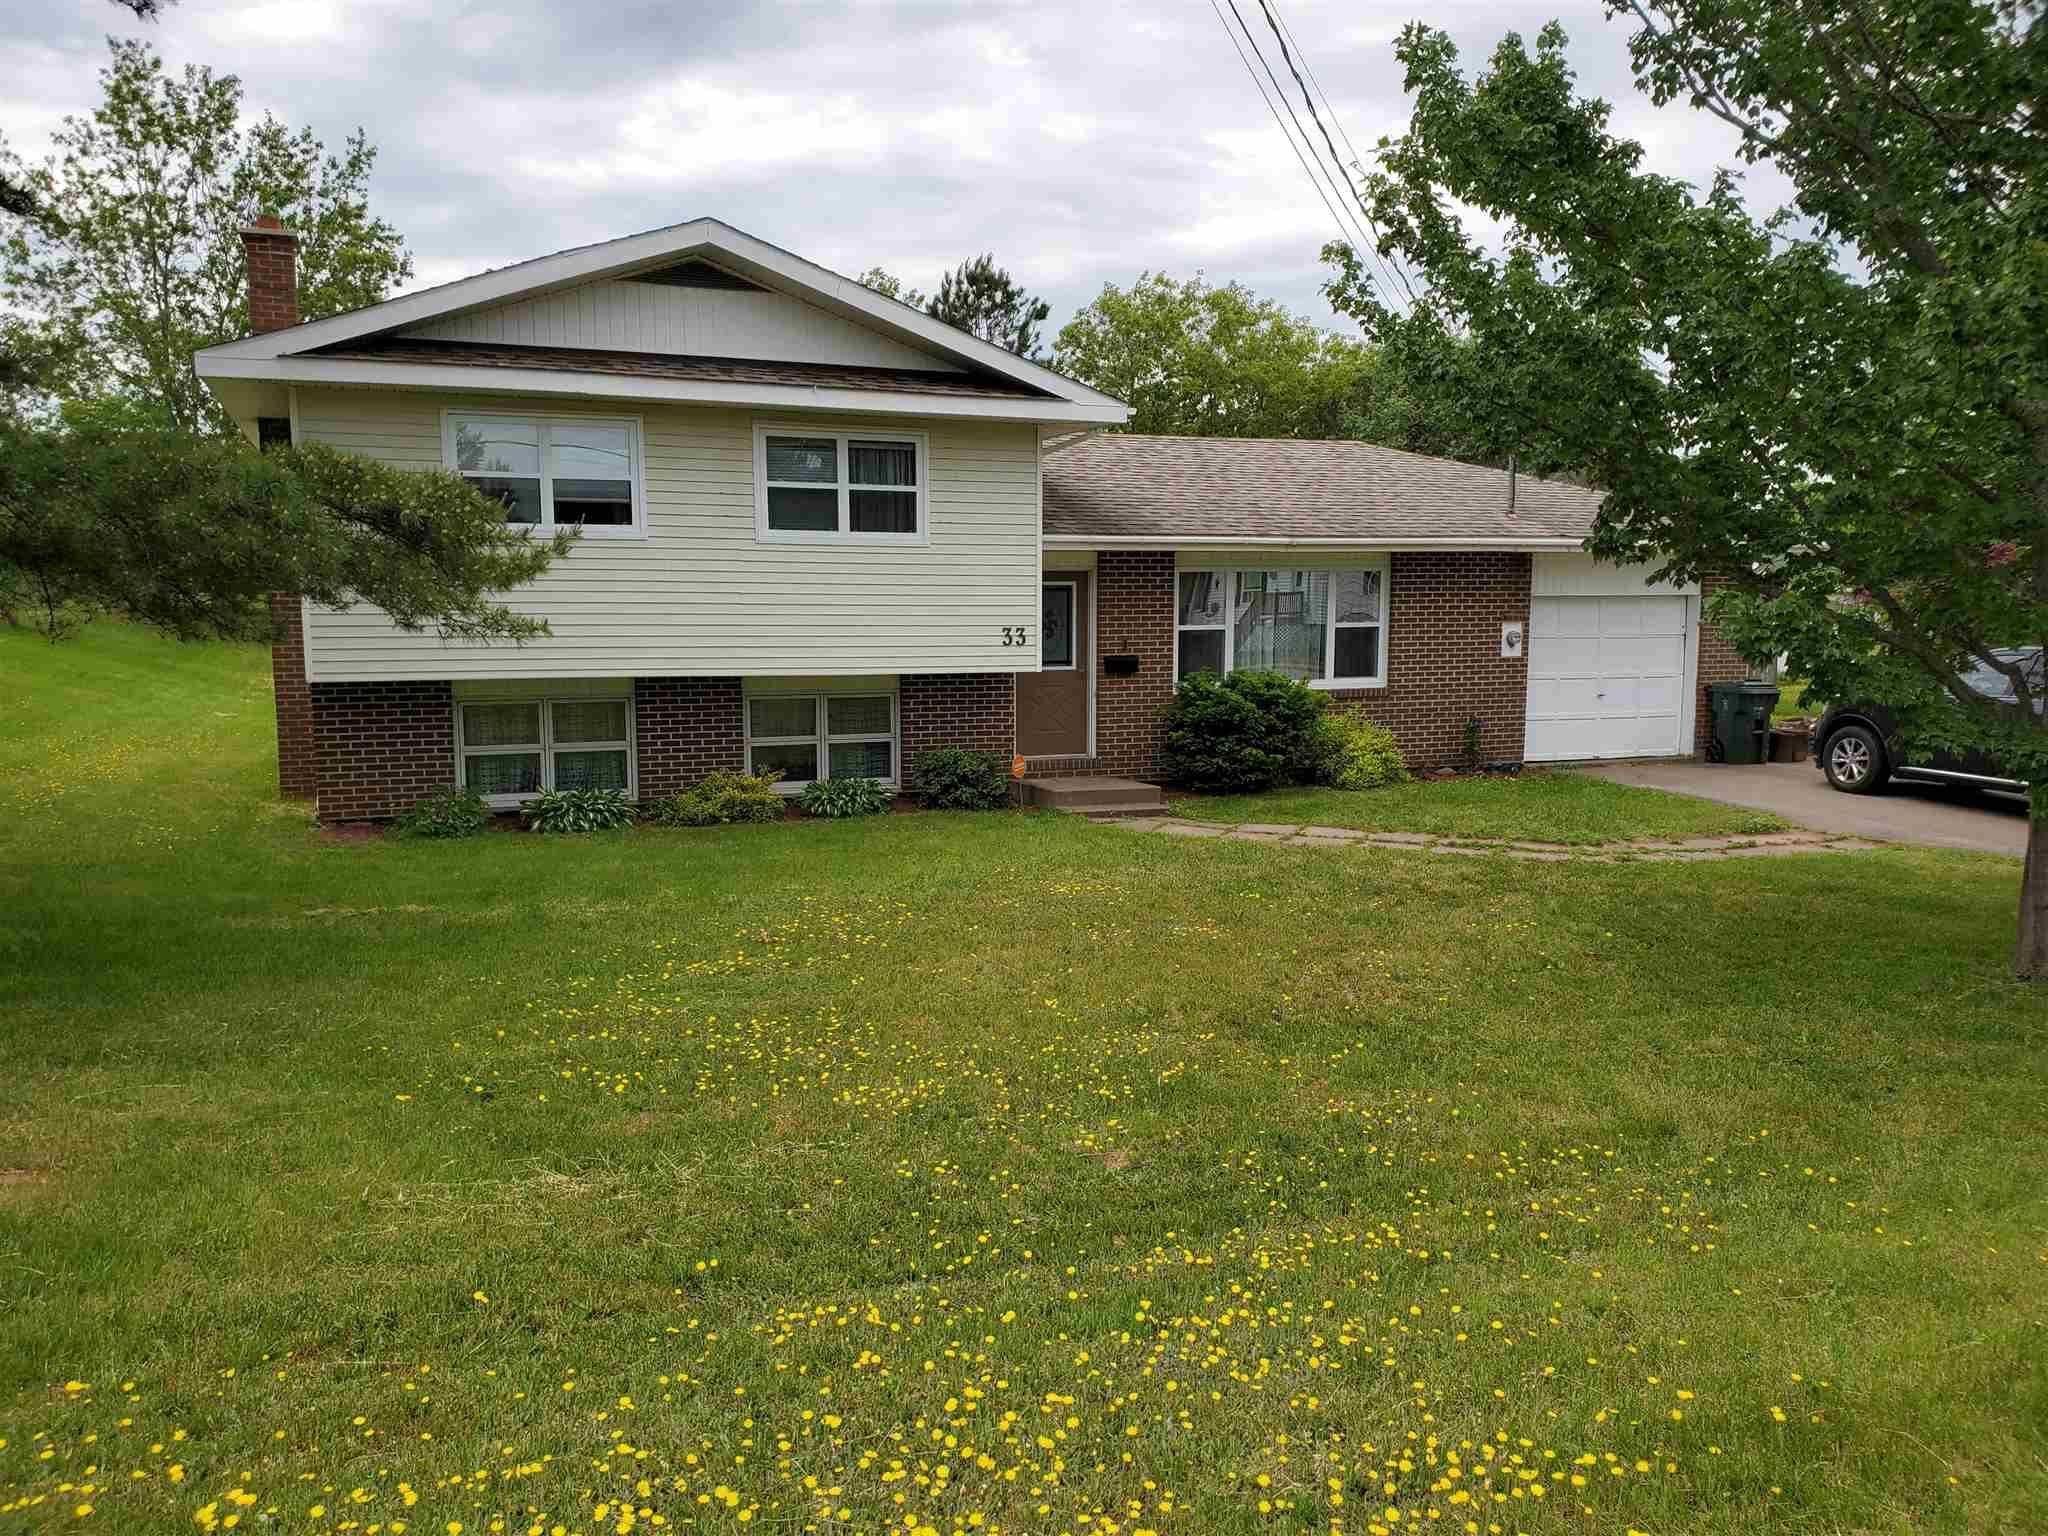 Main Photo: 33 Charles Street in Amherst: 101-Amherst,Brookdale,Warren Residential for sale (Northern Region)  : MLS®# 202116069